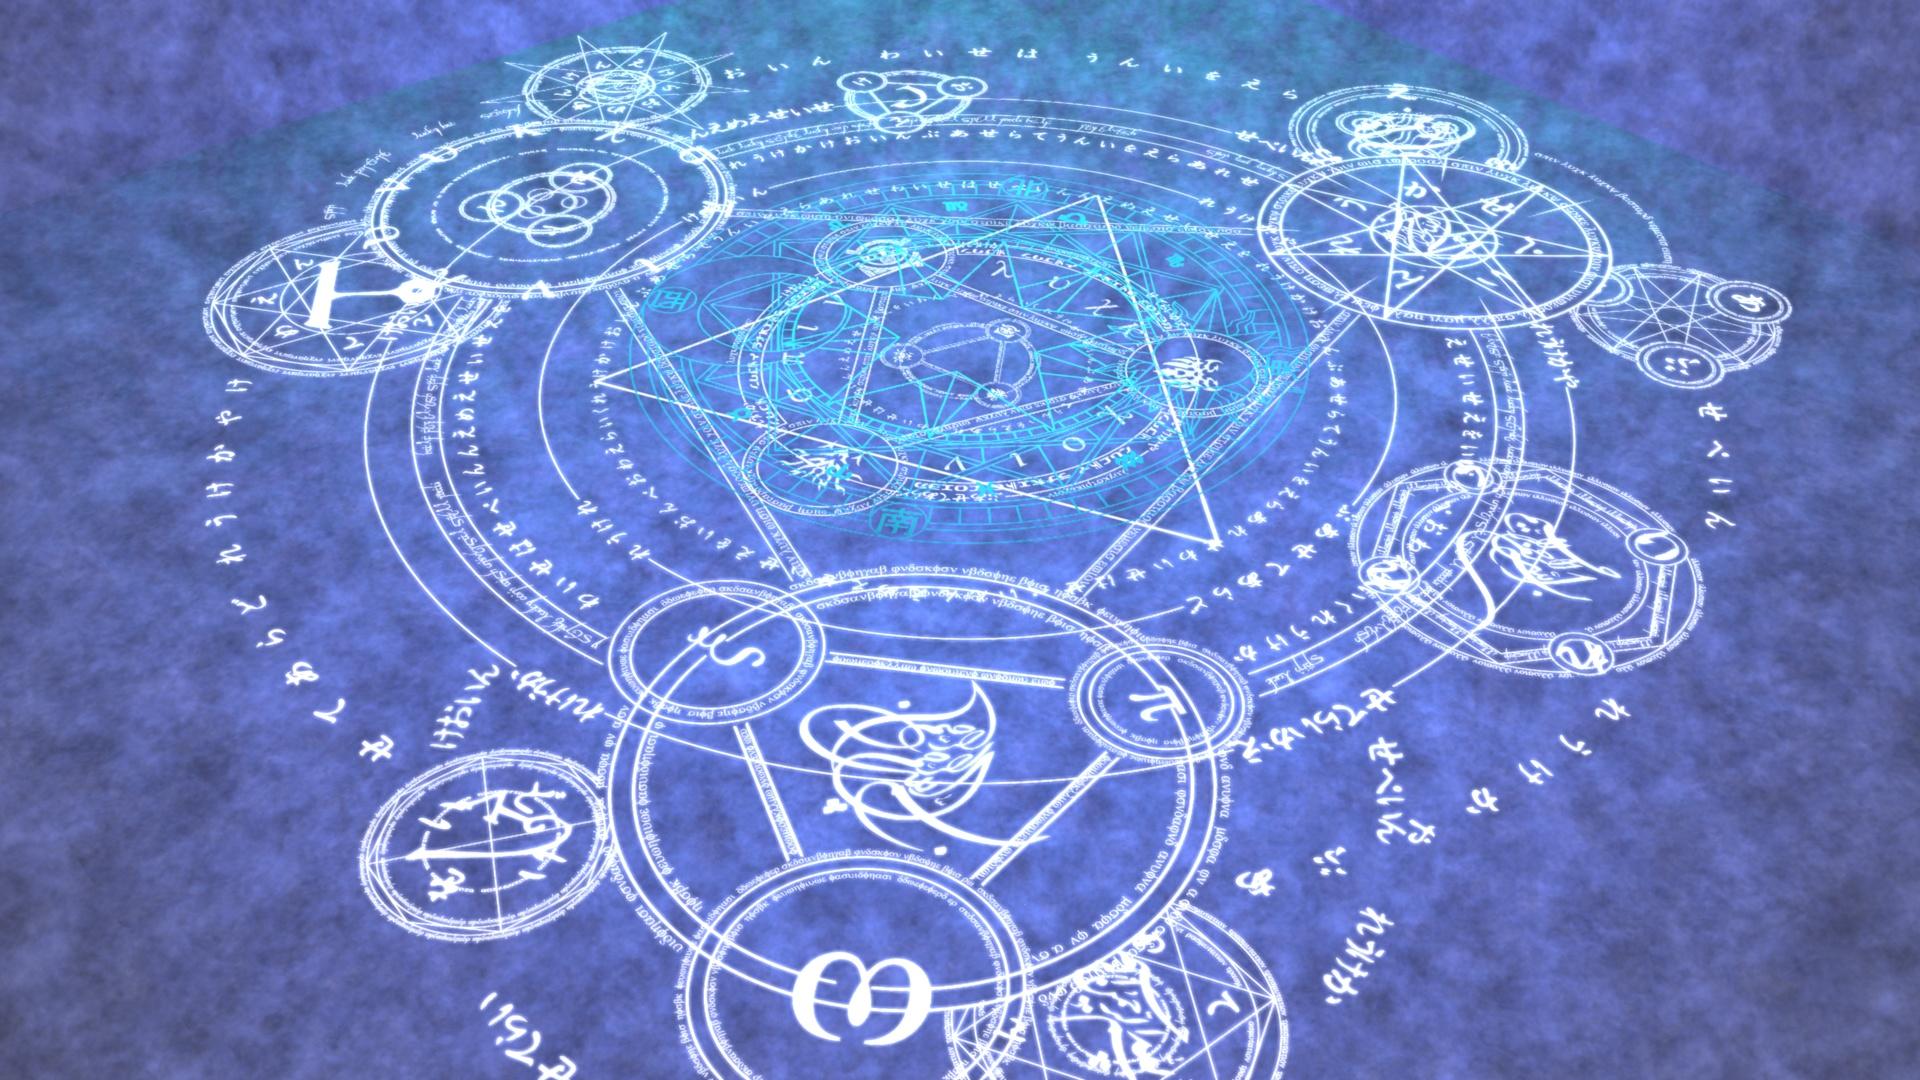 magic_circle_3d_by_zaiggen-d3bcn0x